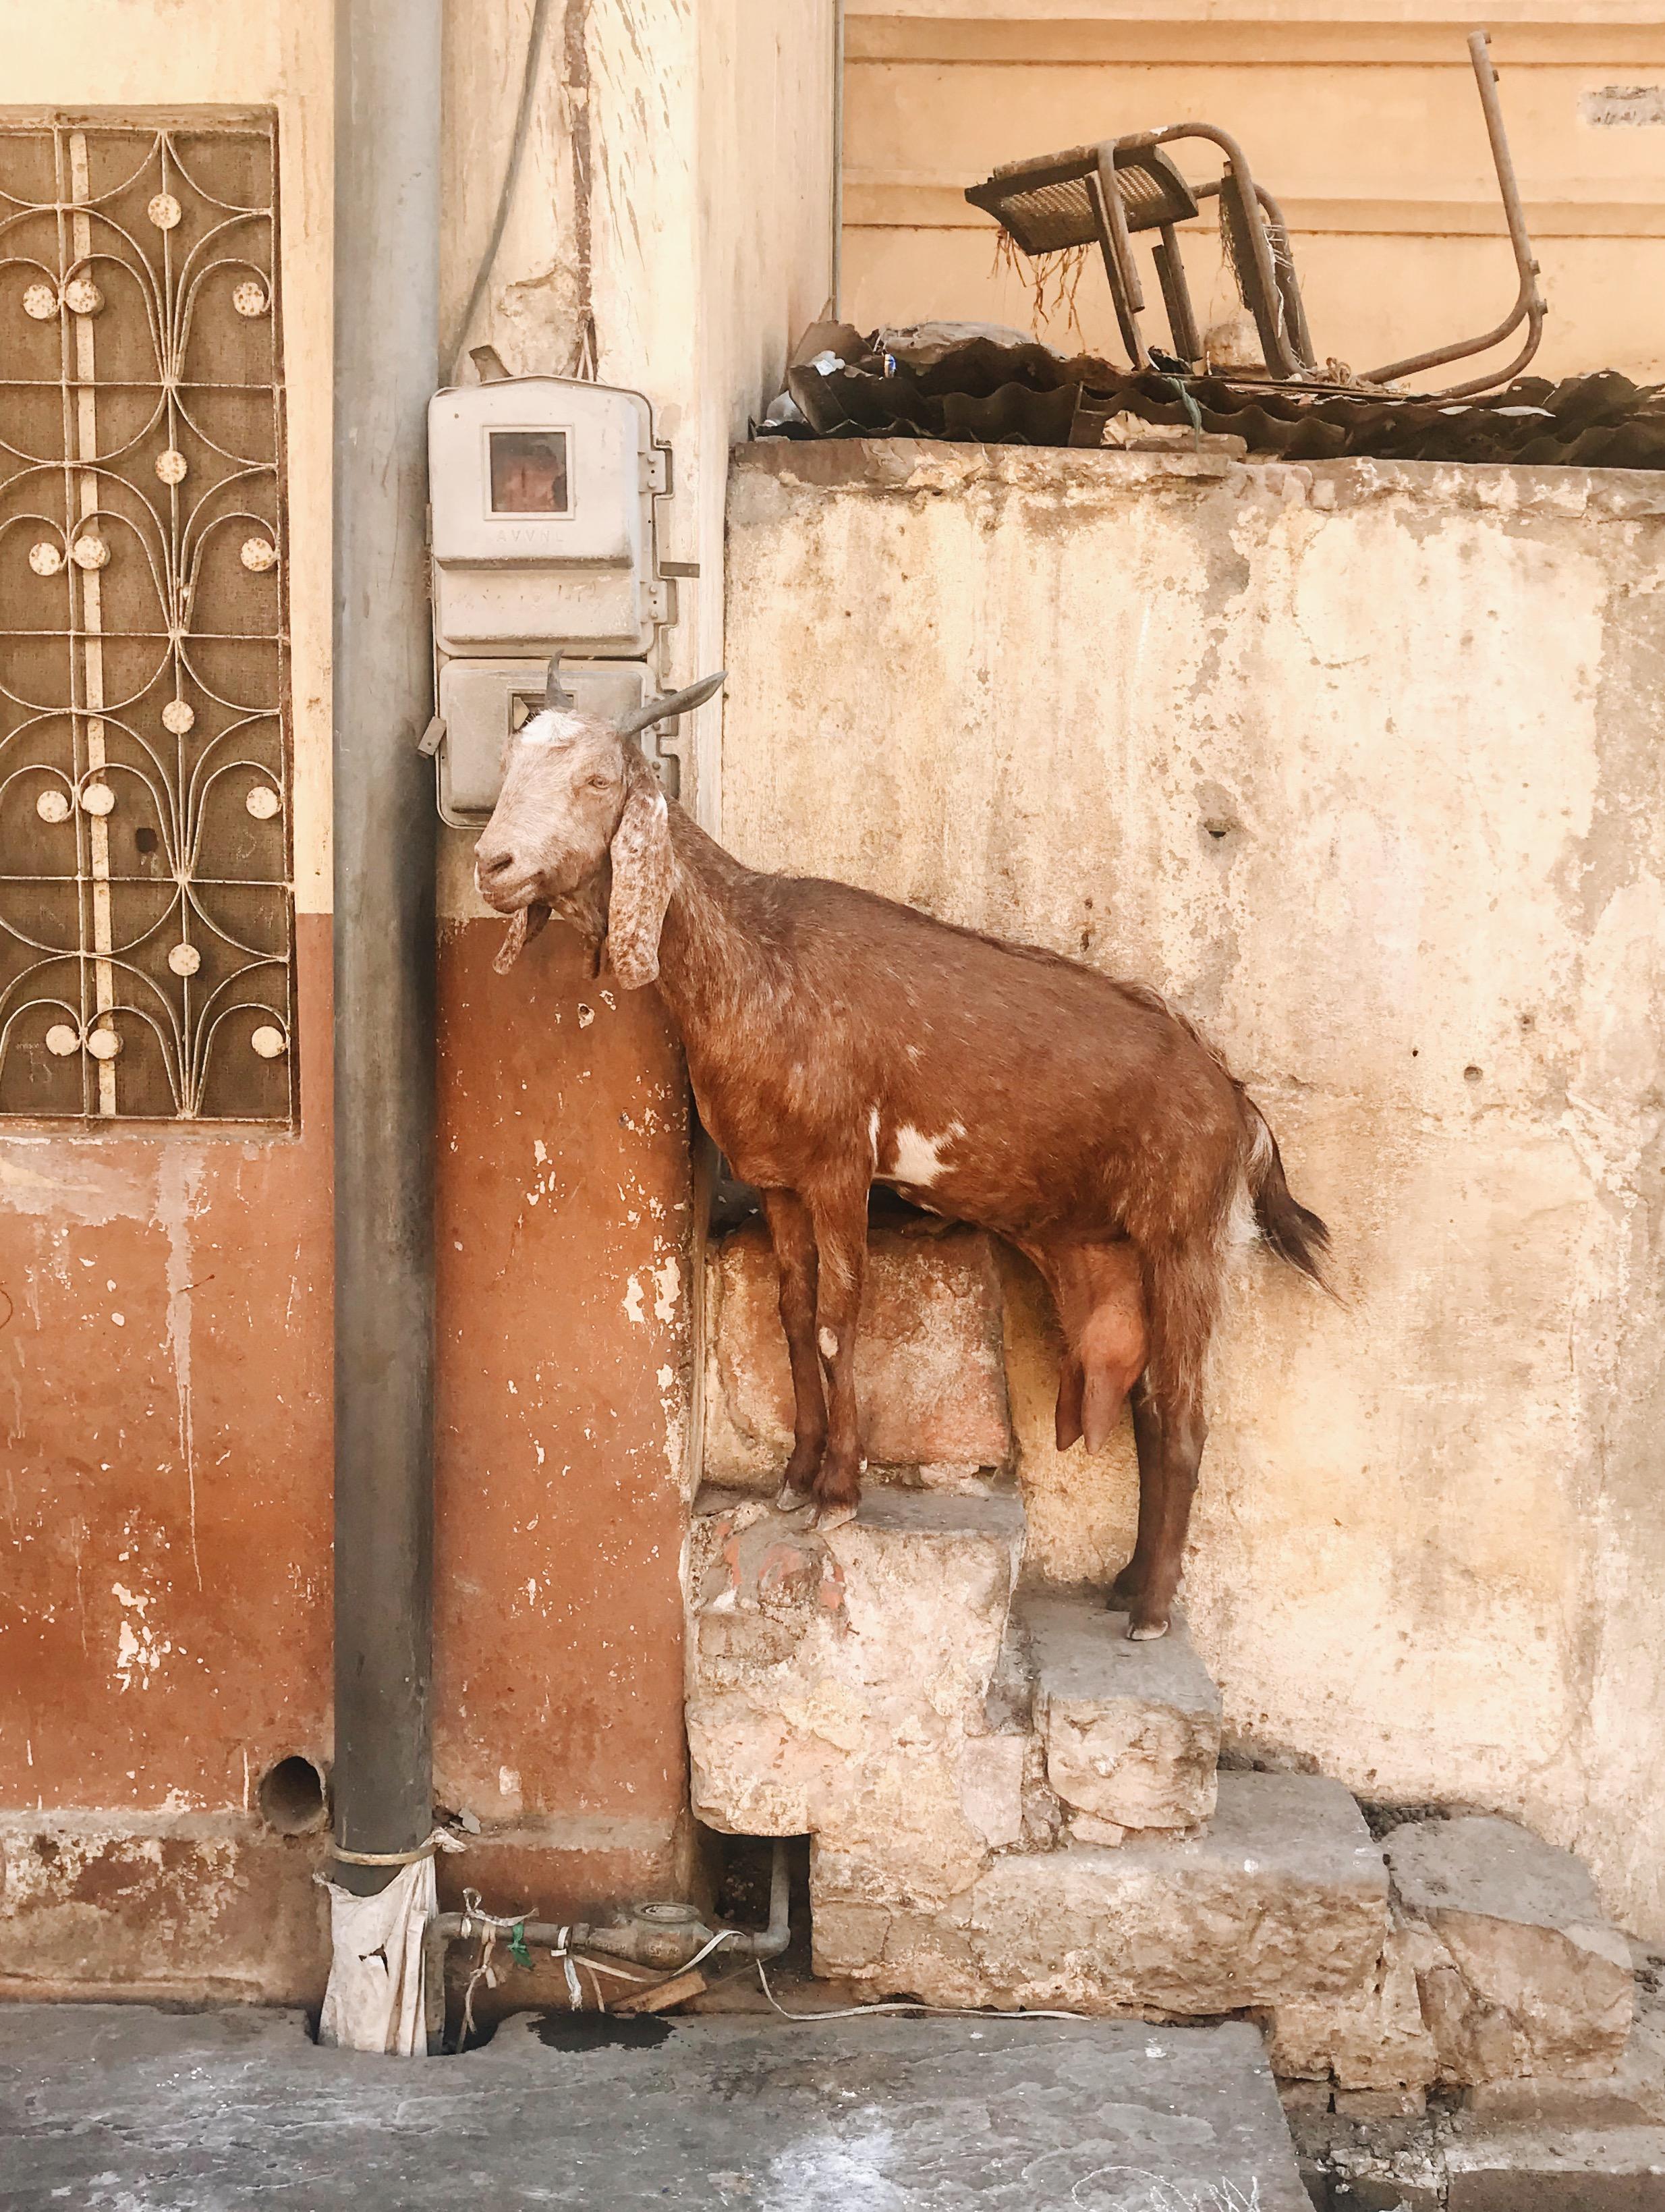 Goat Antics, Old City